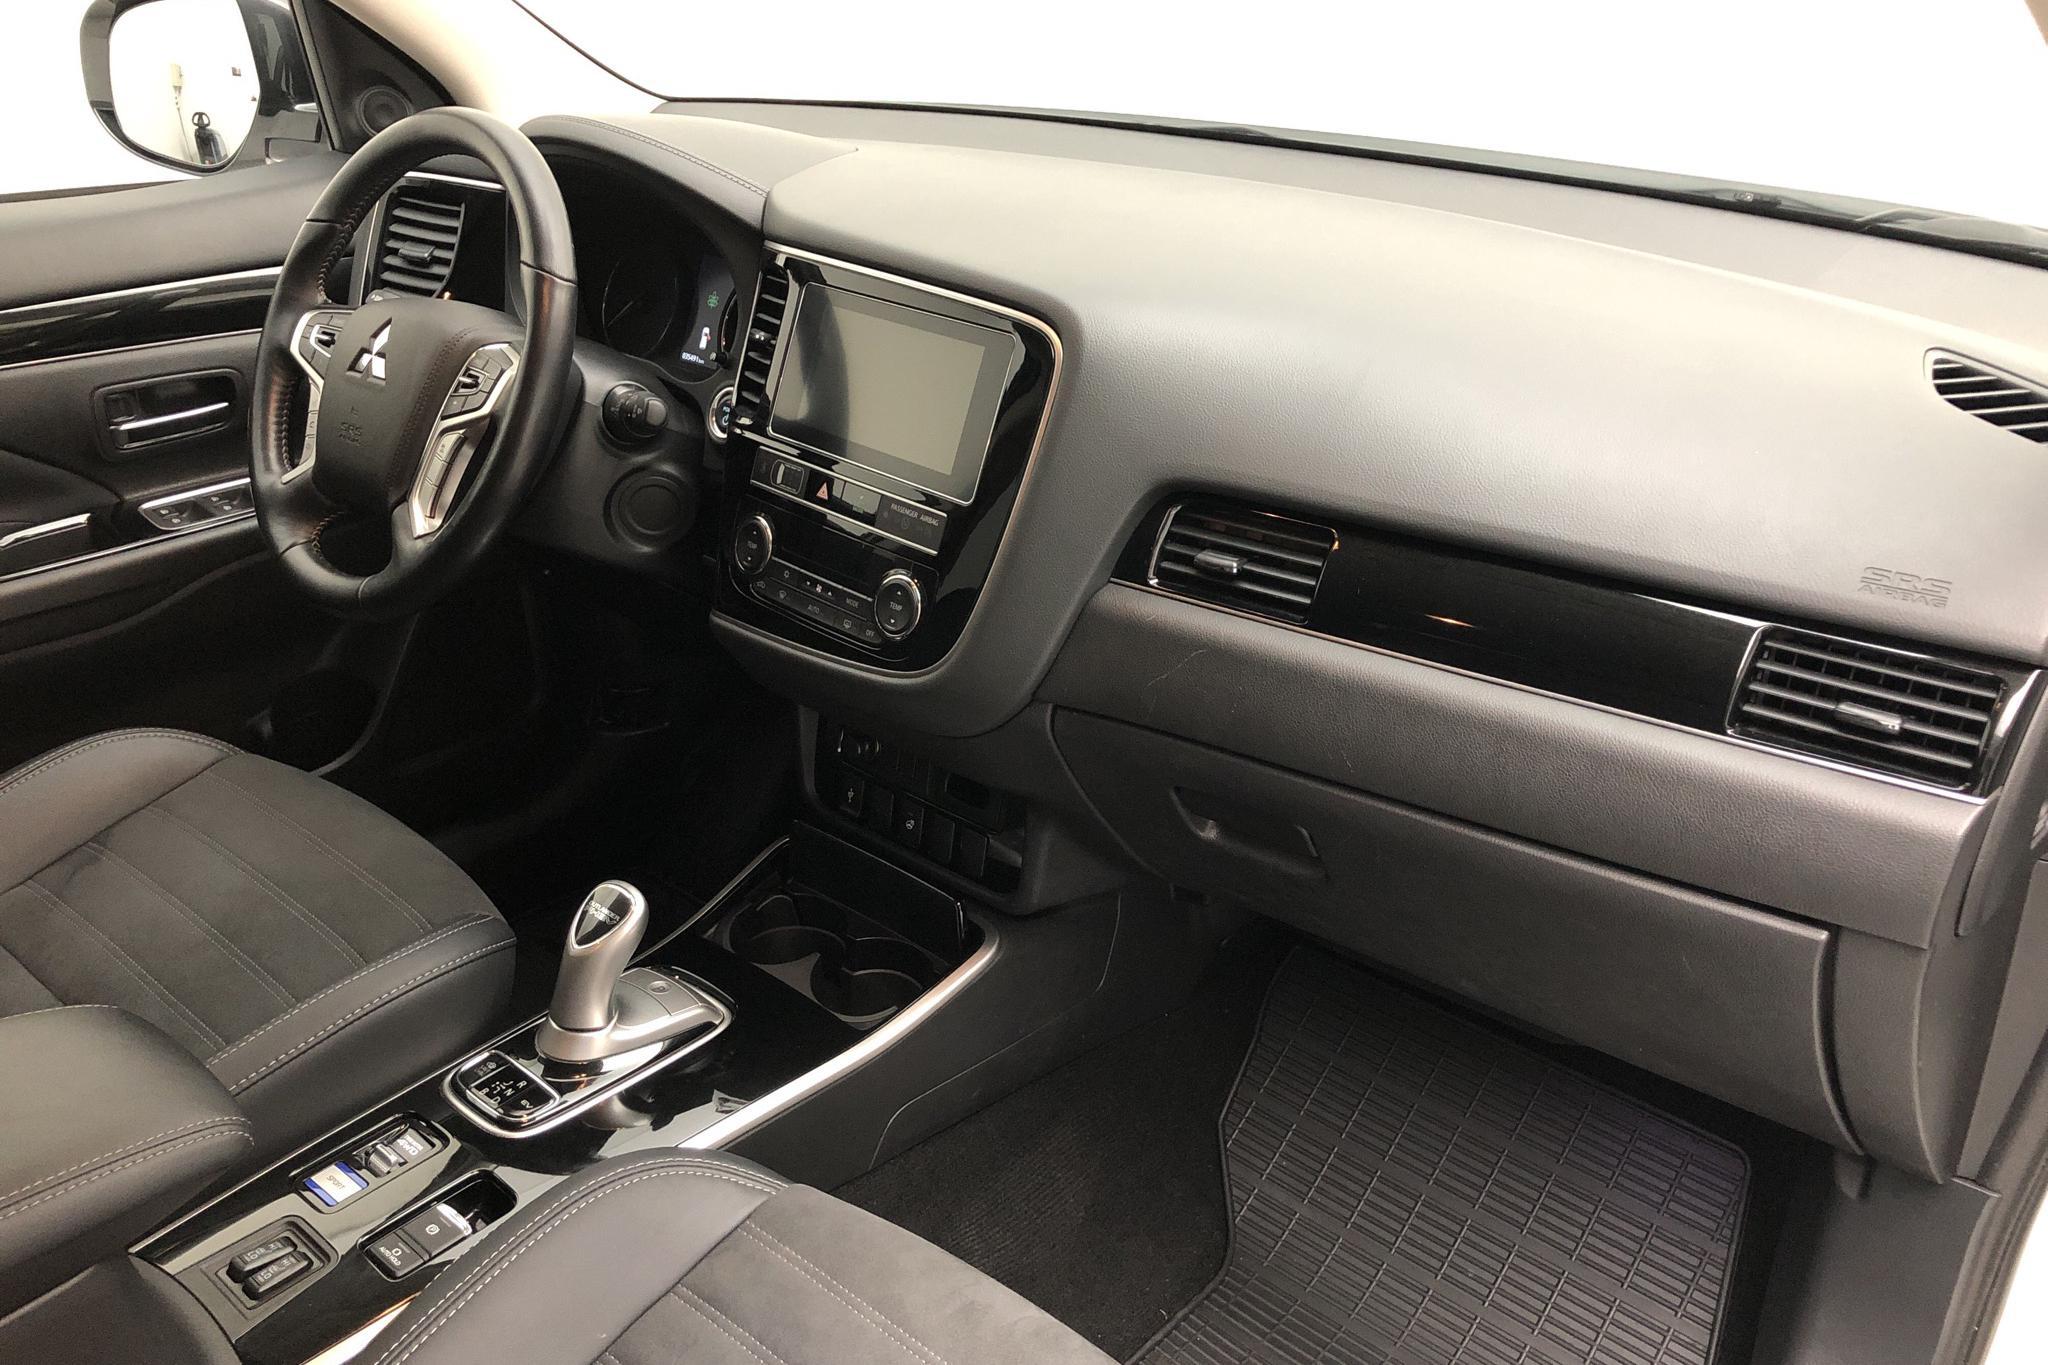 Mitsubishi Outlander 2.4 Plug-in Hybrid 4WD (136hk) - 0 km - Automatic - white - 2019